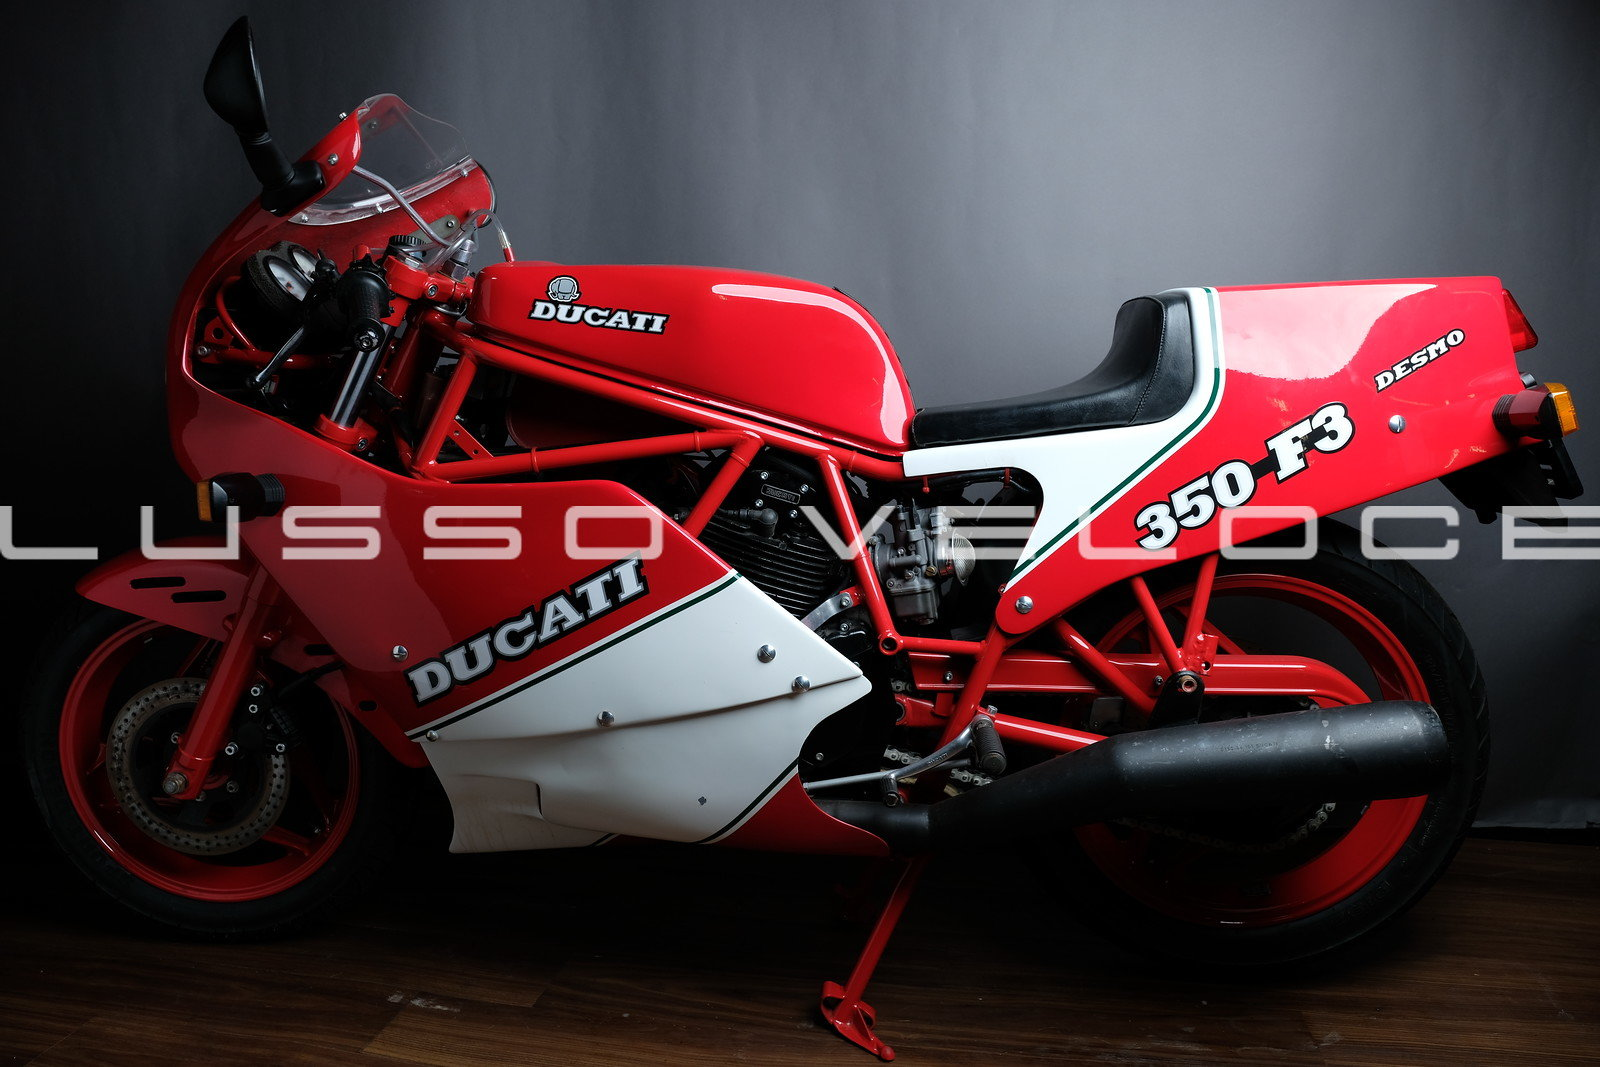 1986 Rare Ducati F3 350 fully restored For Sale (picture 11 of 15)